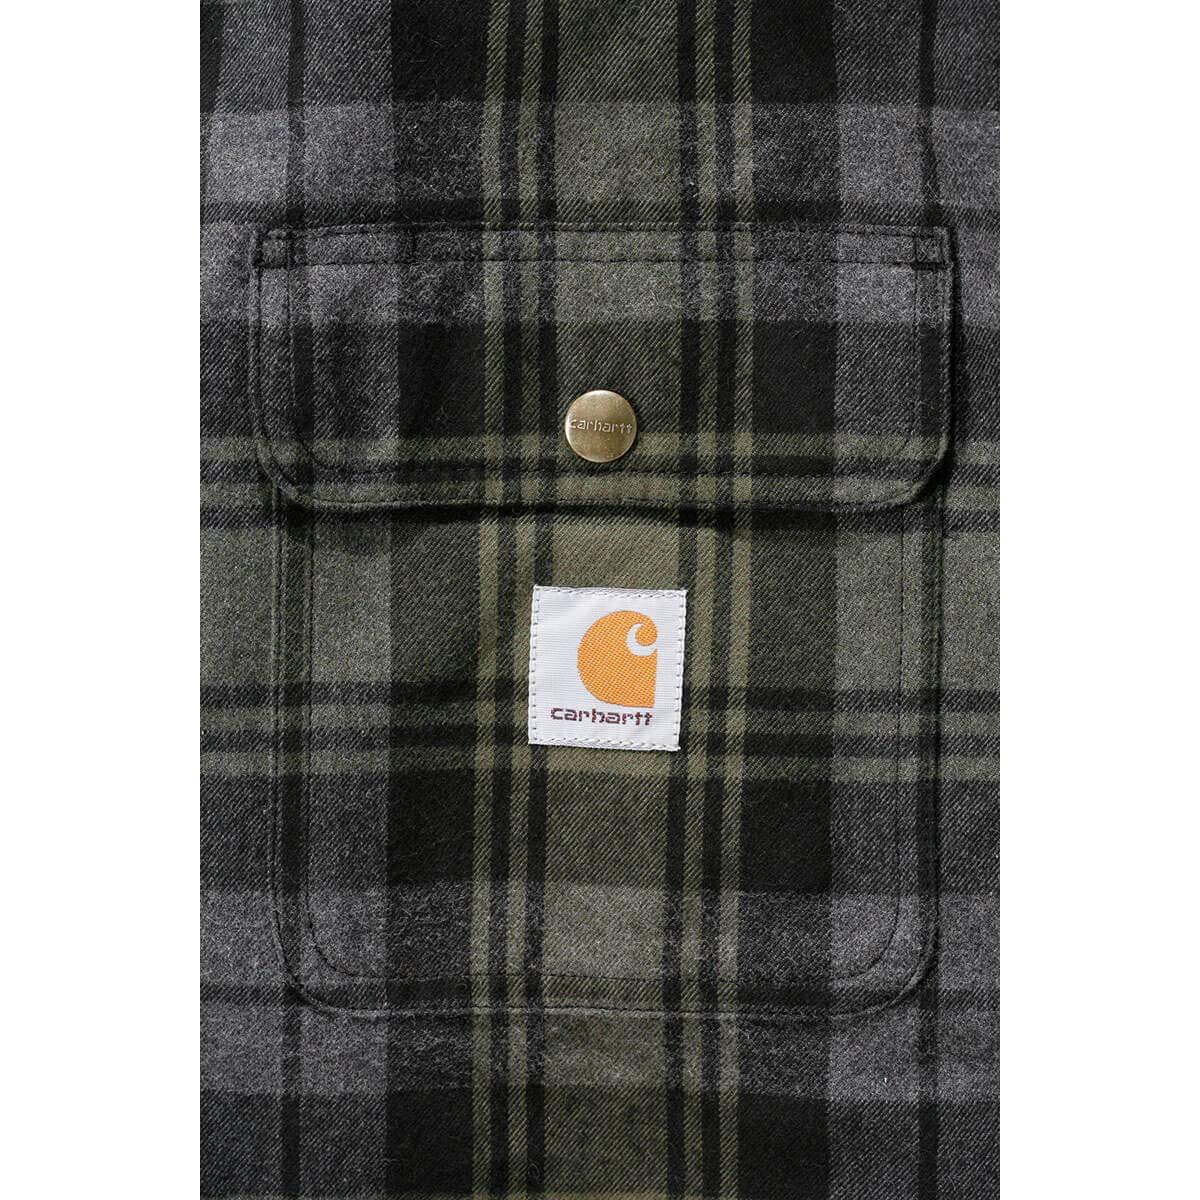 Carhartt Jacket Hubbard Shirt Point de Riz